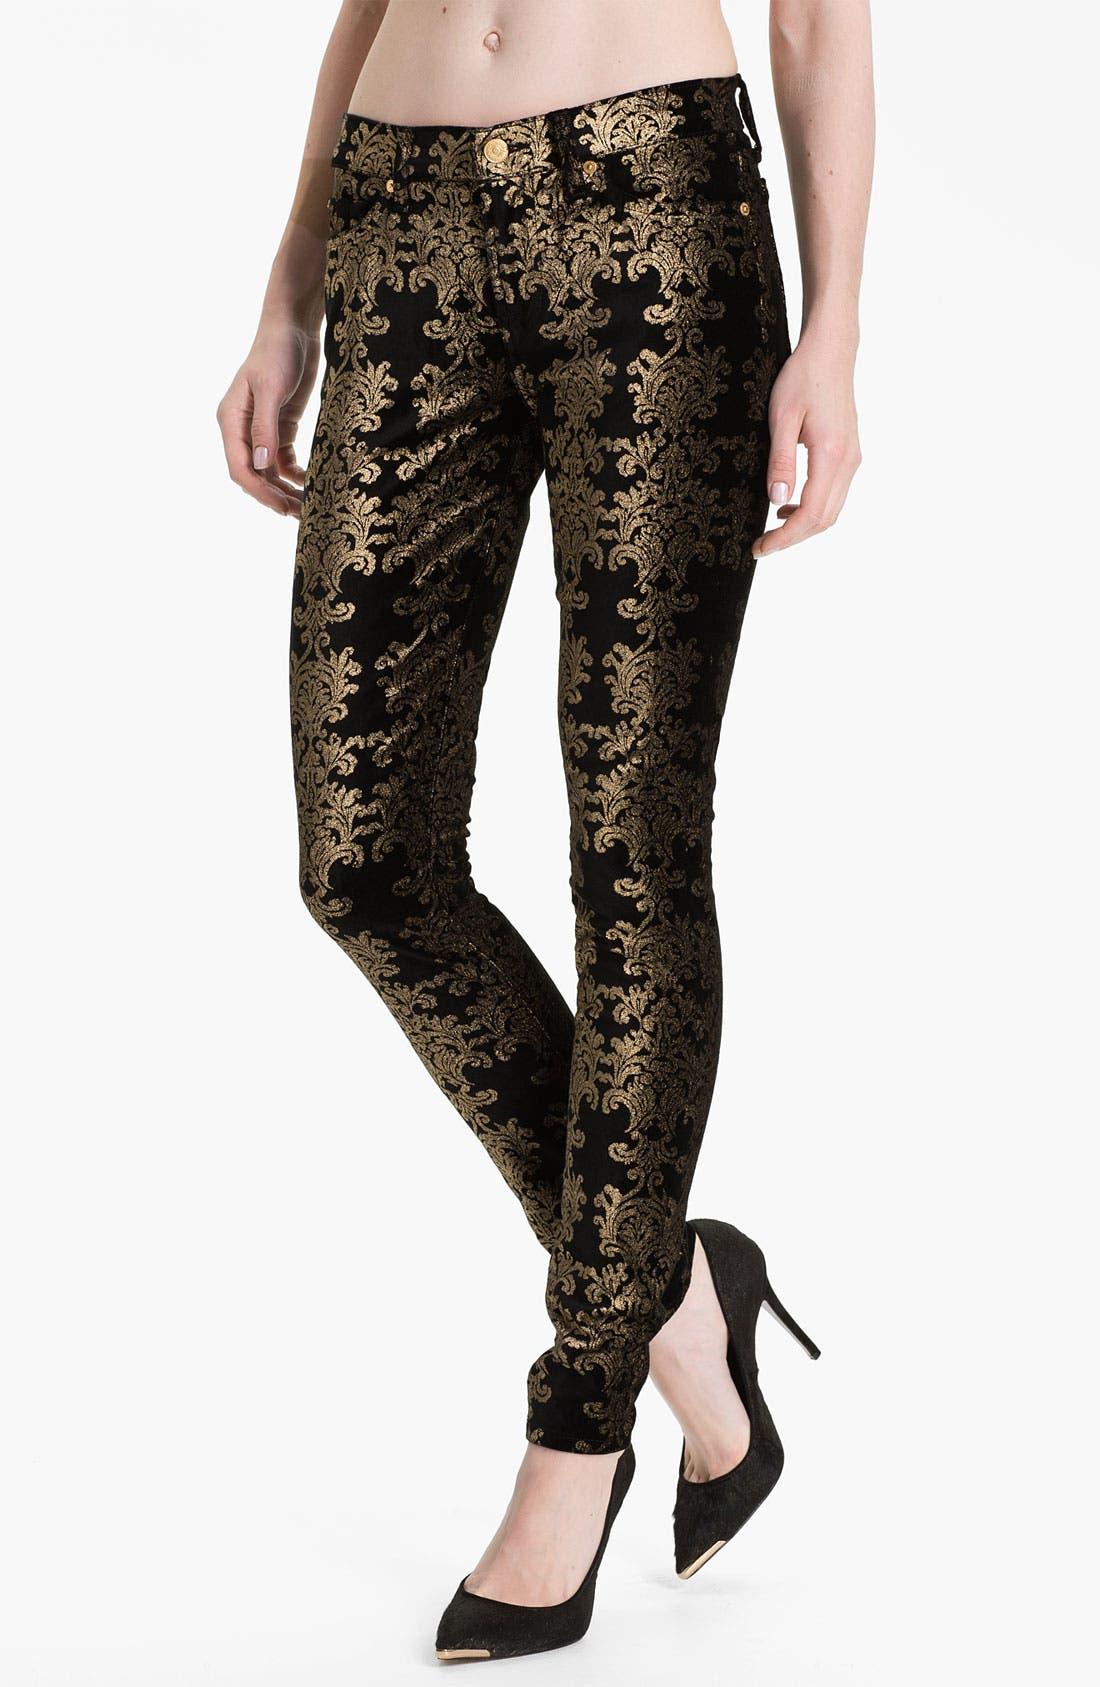 Main Image - 7 For All Mankind® 'The Skinny' Foil Print Jeans (Black/Gold Foil)